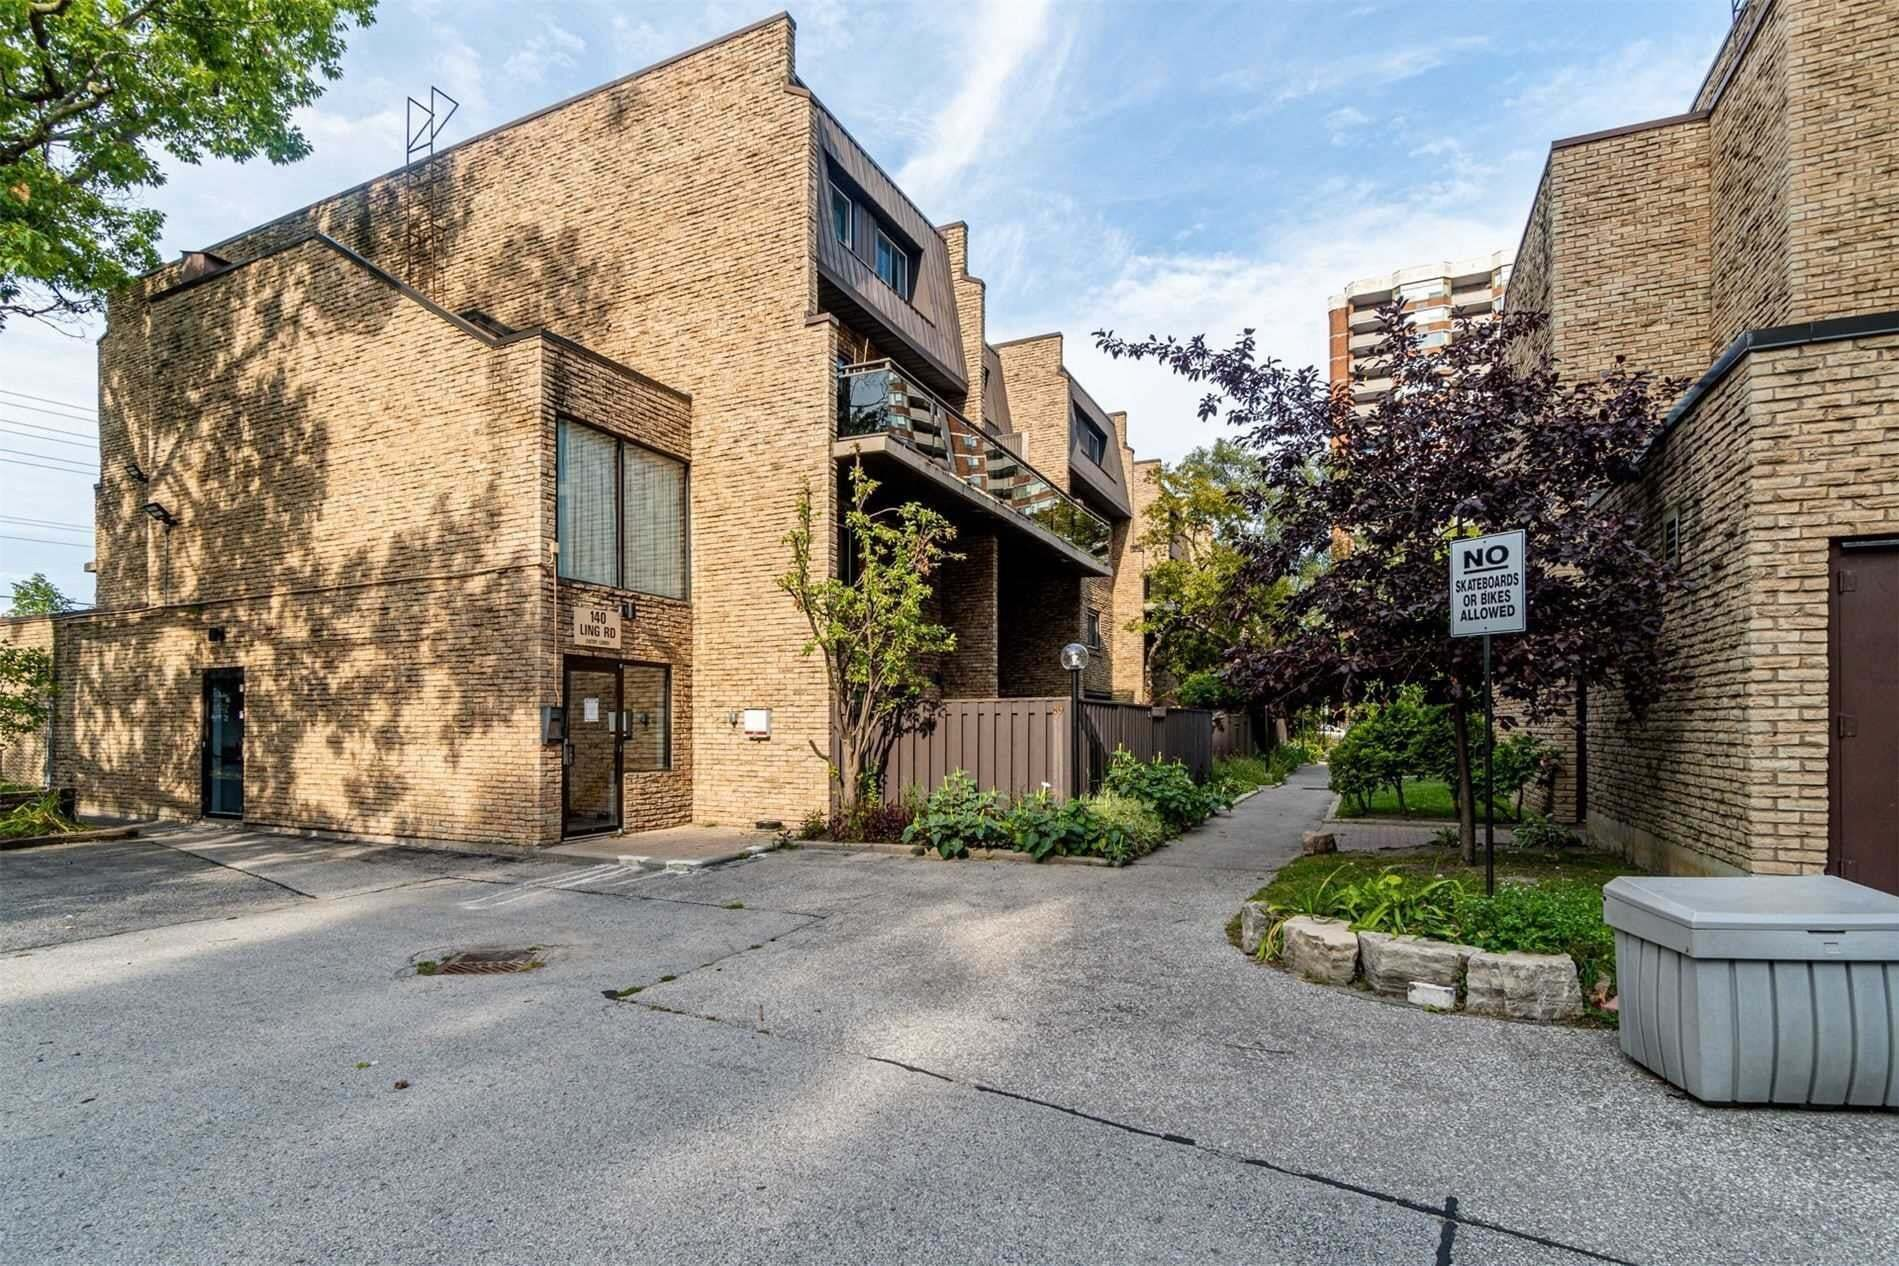 Buliding: 140 Ling Road, Toronto, ON